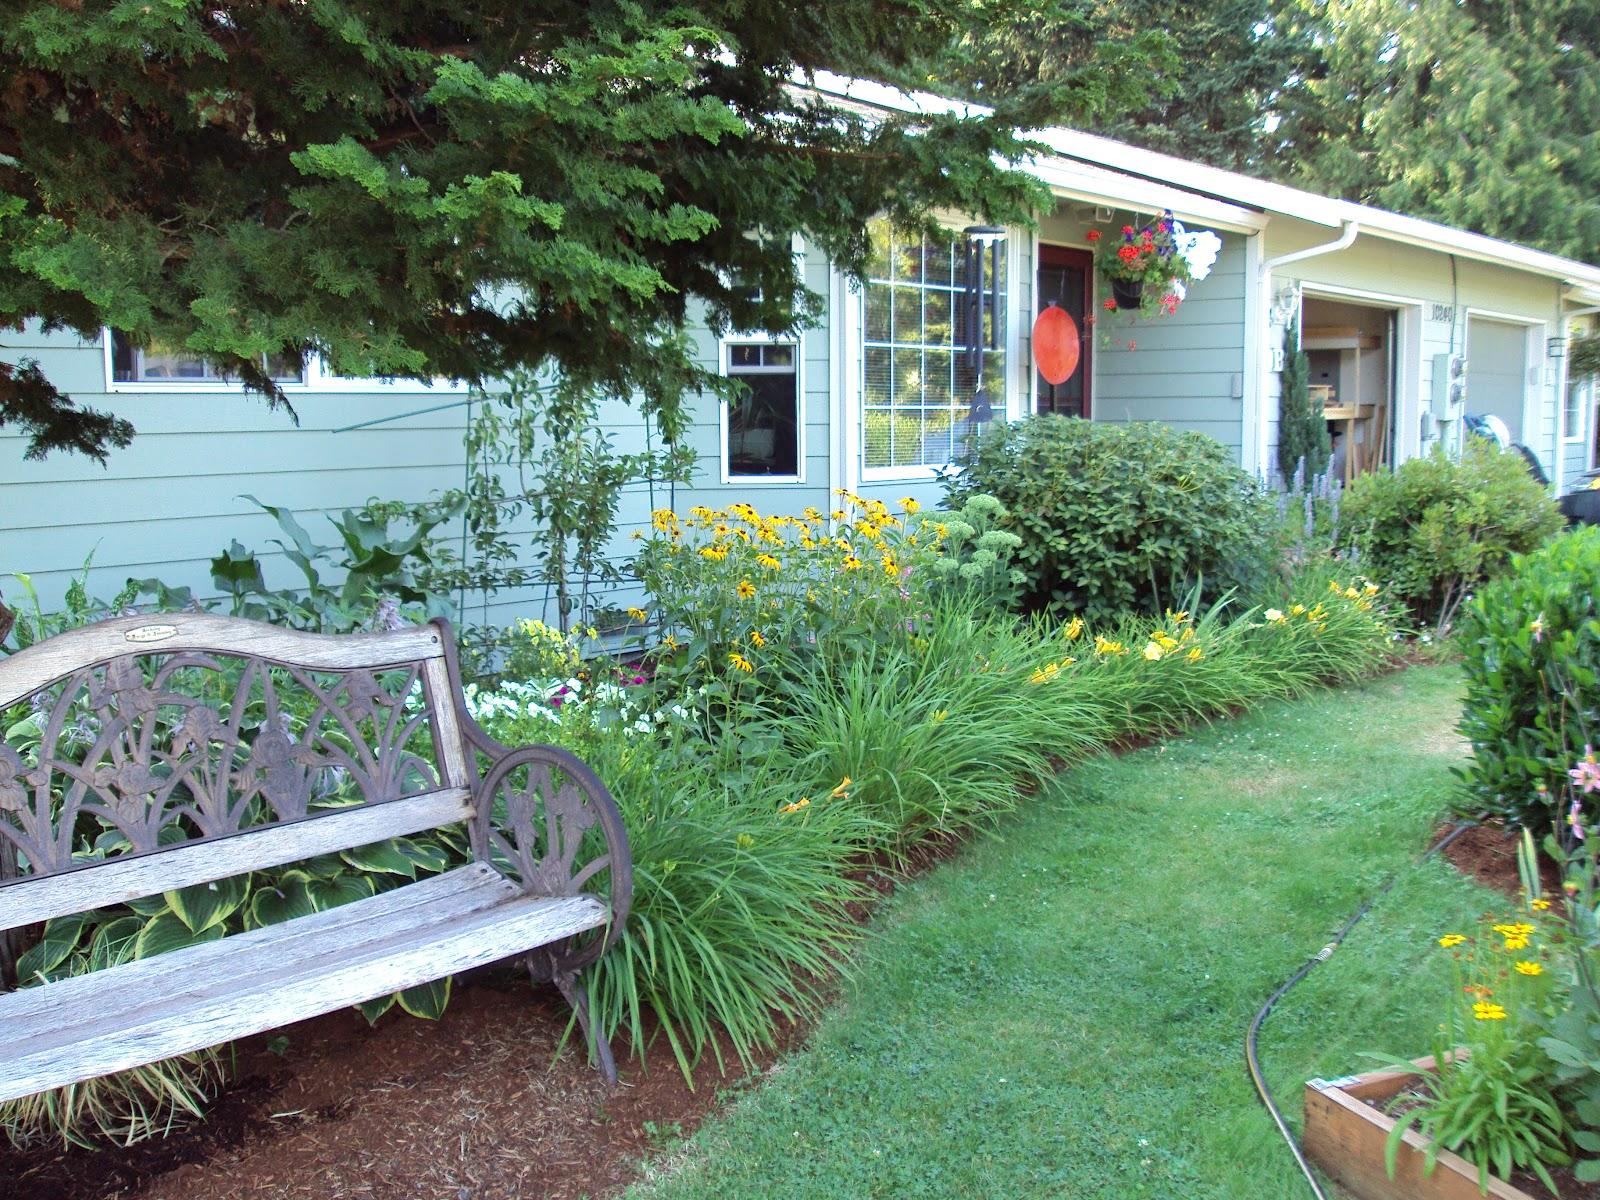 linda u0026 39 s serenity garden  garden design